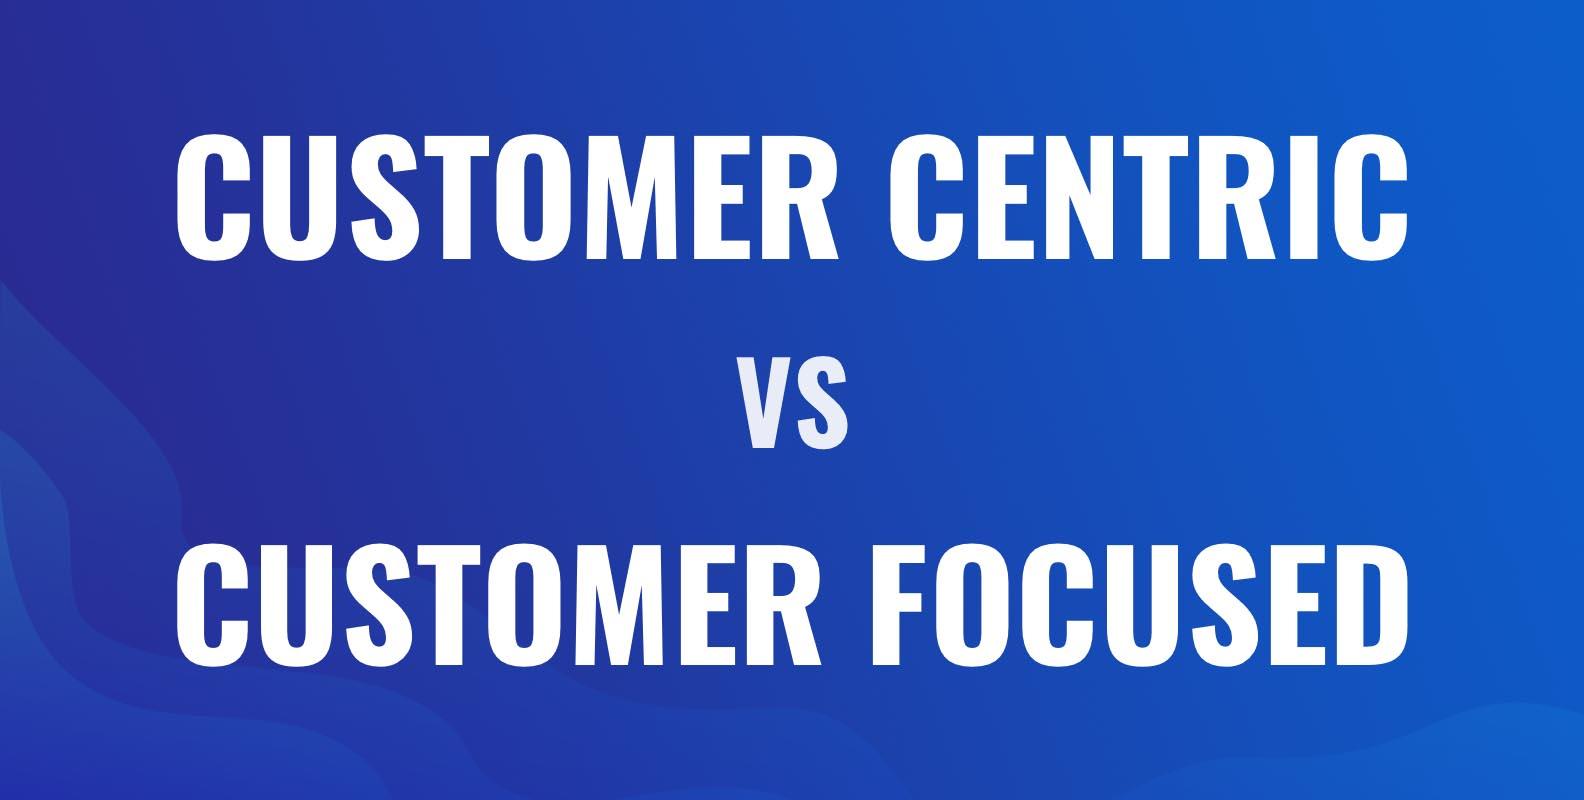 Customer_Centric